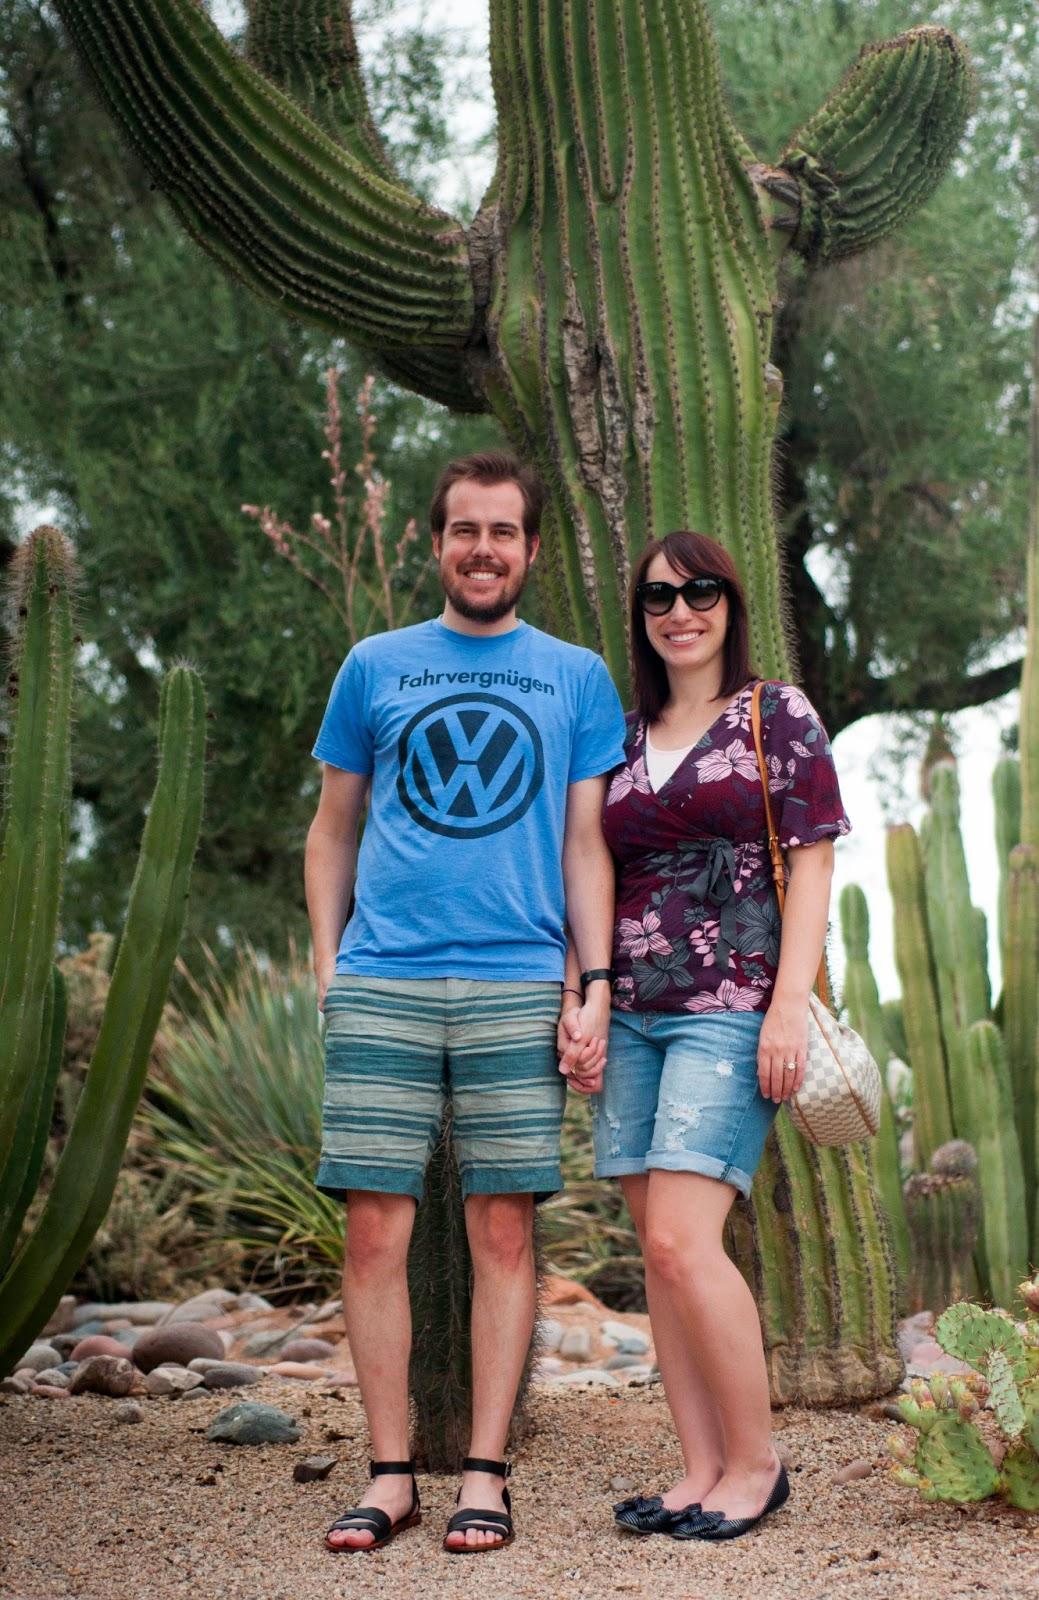 couple fashion, style blog, mens style, rocket dog, man sandals, cactus, jcrew stripe shorts, ootd